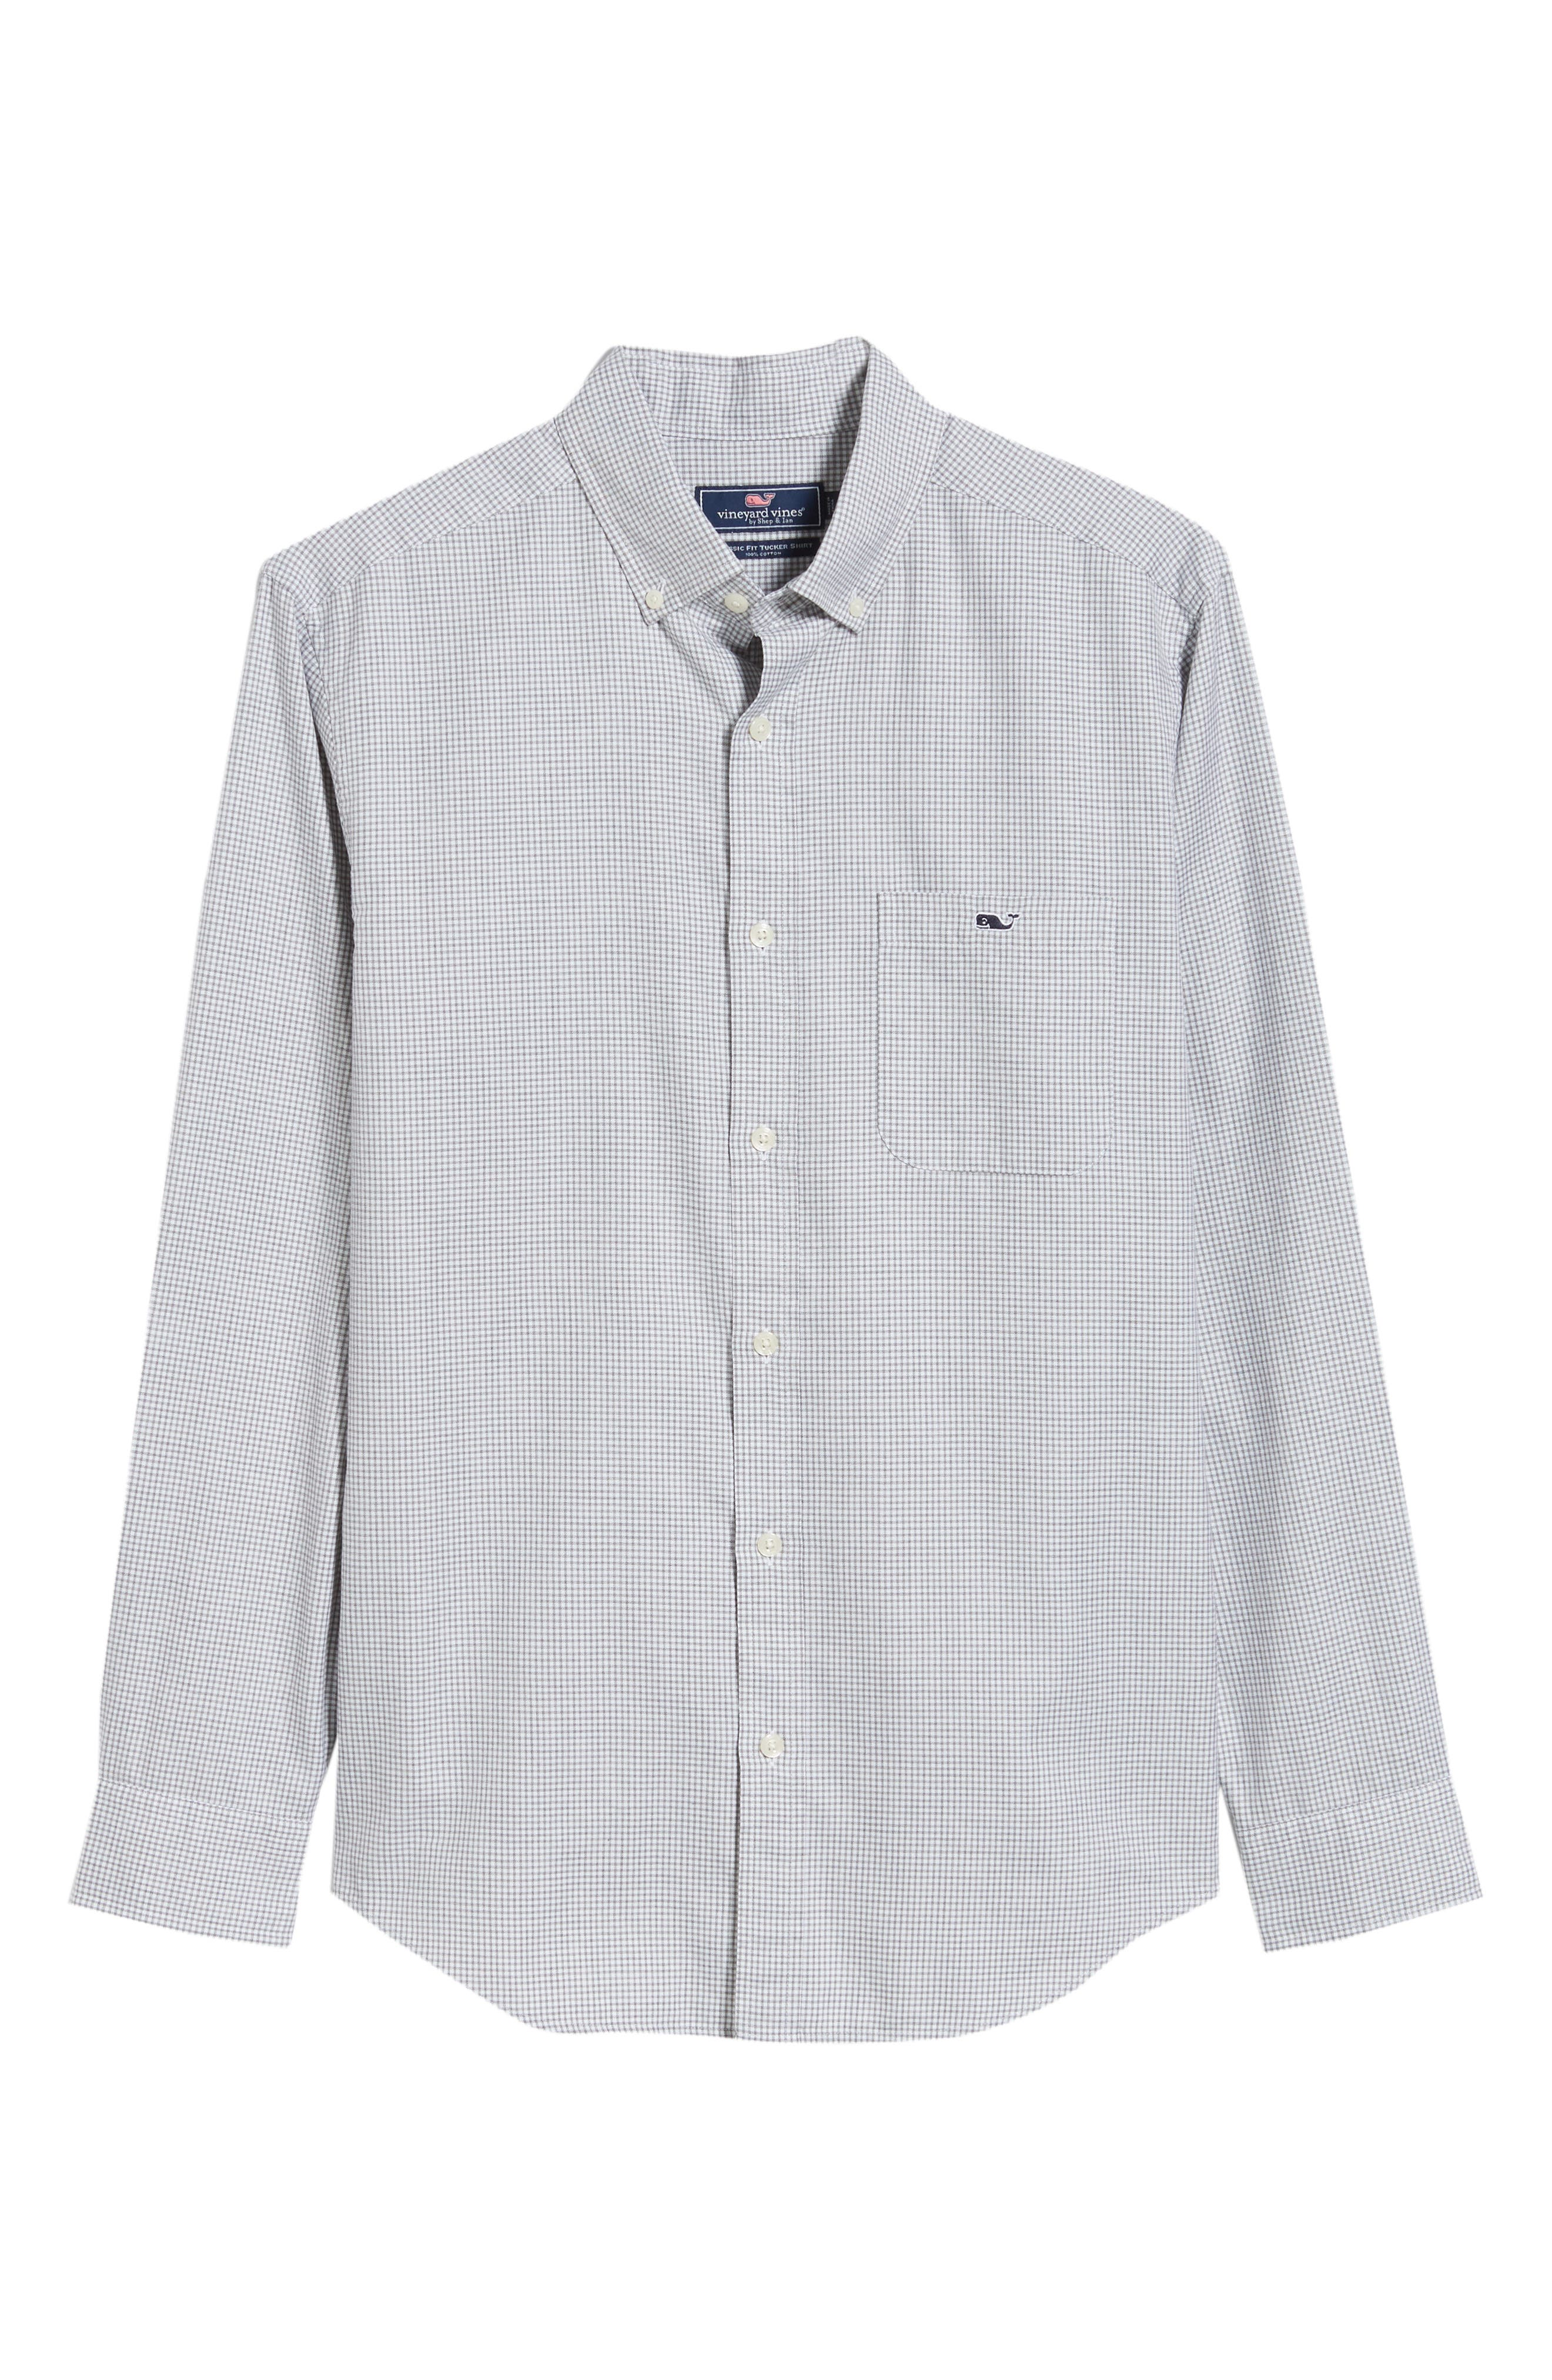 Kettle Cove Regular Fit Gingham Sport Shirt,                             Alternate thumbnail 5, color,                             BARRACUDA